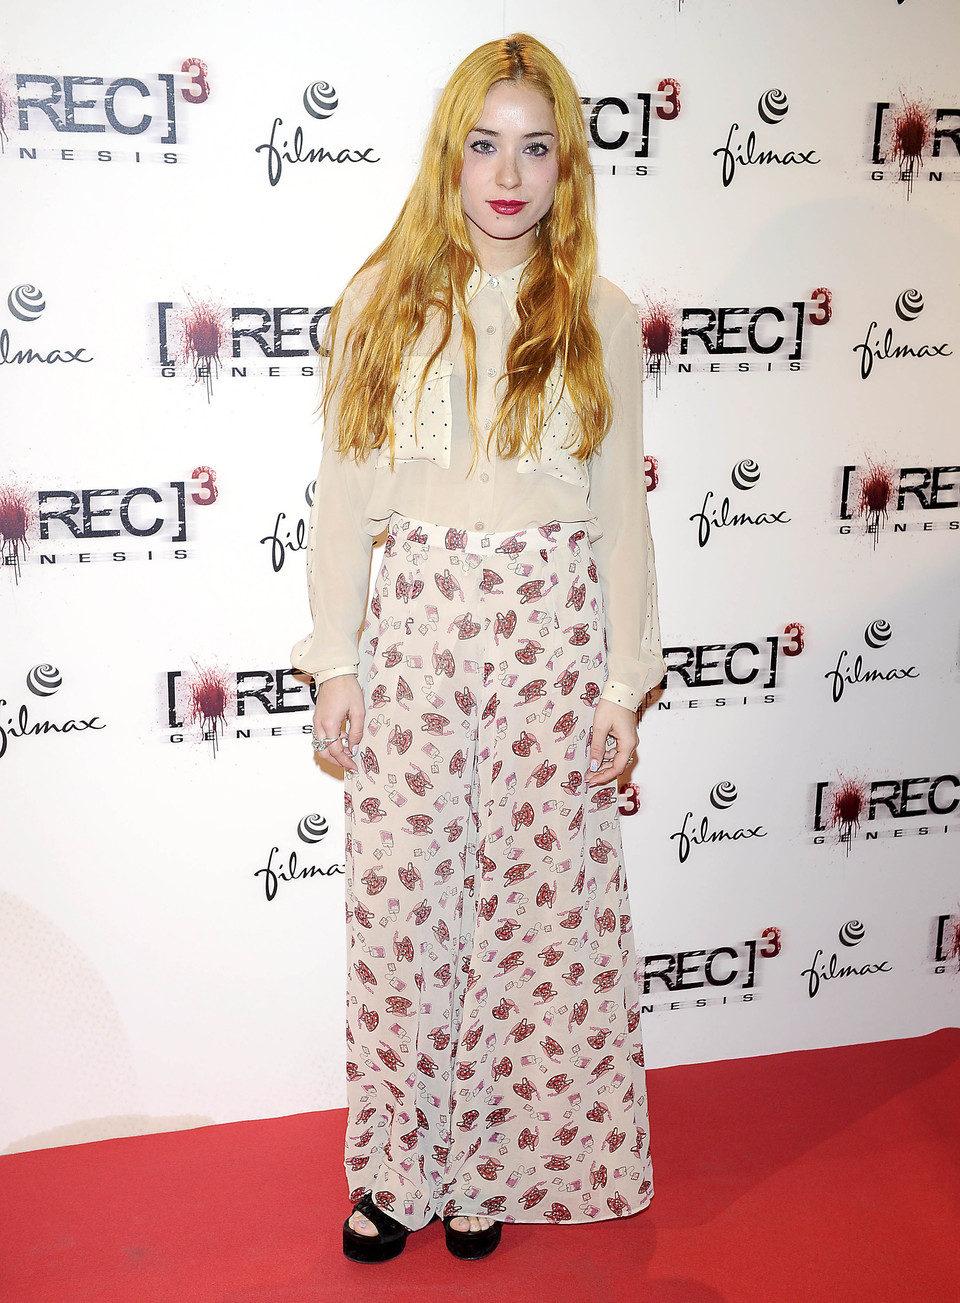 Miranda Makaroff en el estreno de '[REC] 3: Génesis' en Madrid